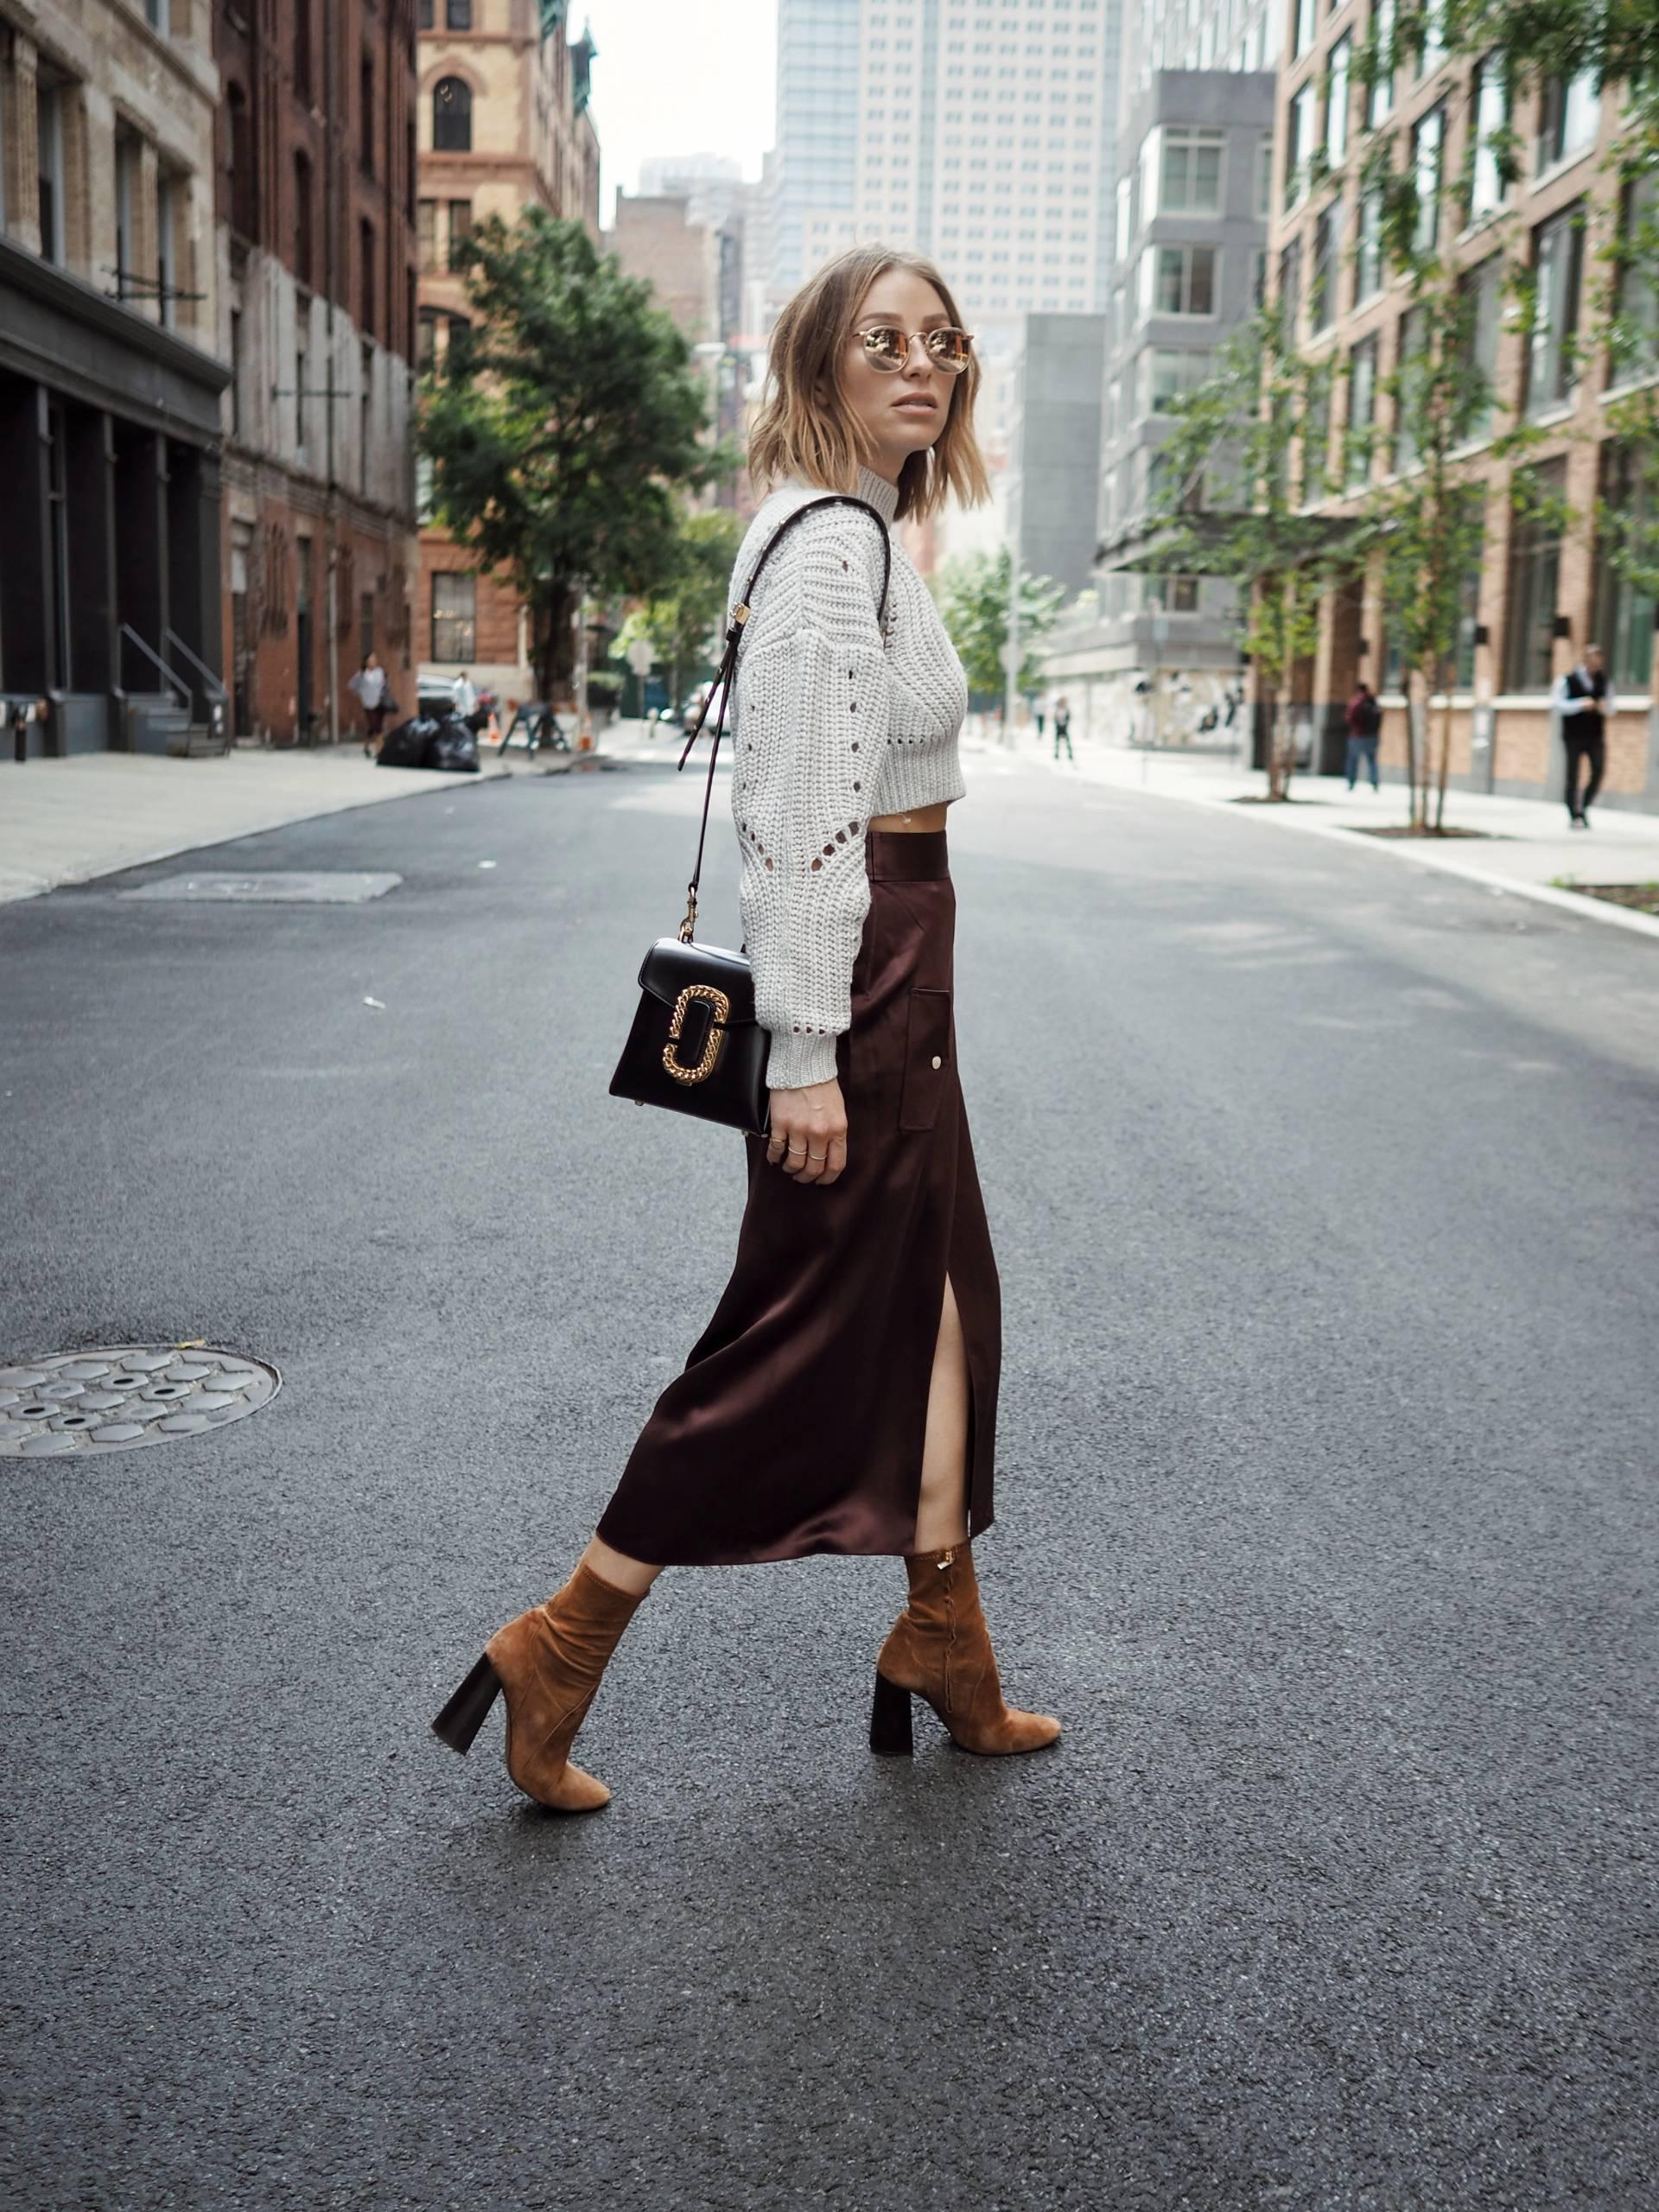 NYFW 2017 street style